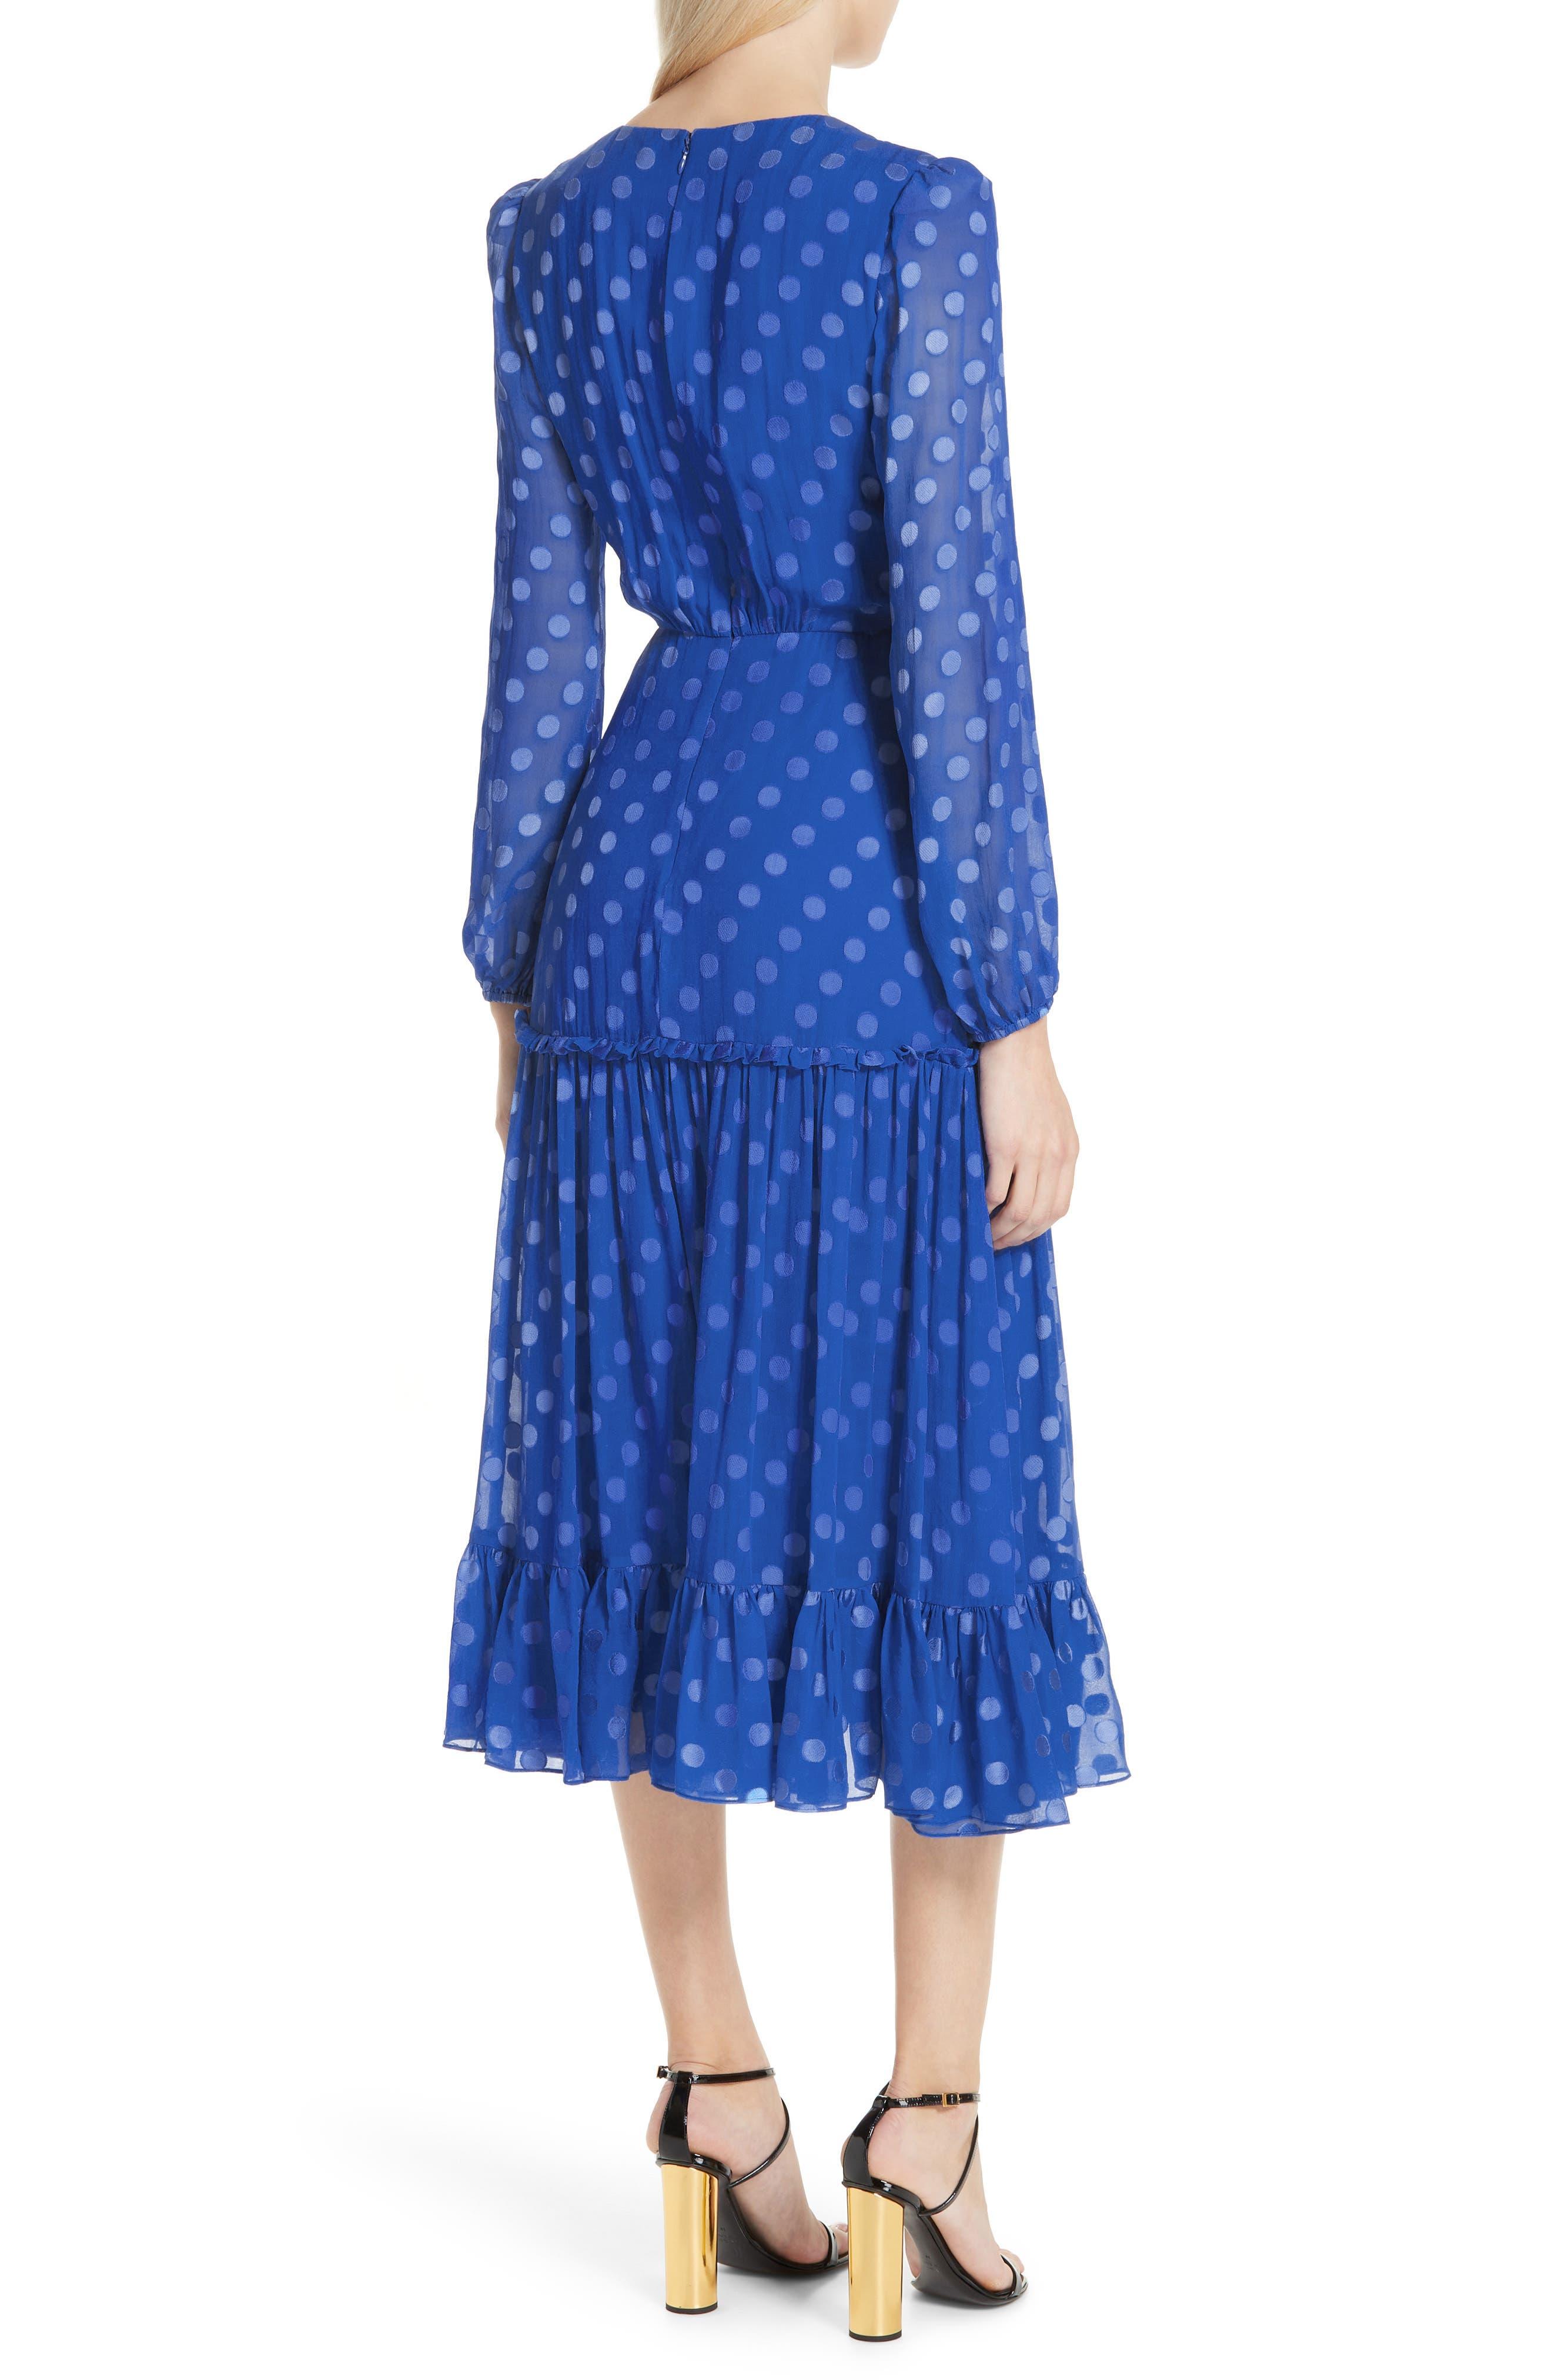 SALONI, Polka Dot Ruffle Dress, Alternate thumbnail 2, color, COBALT BLUE